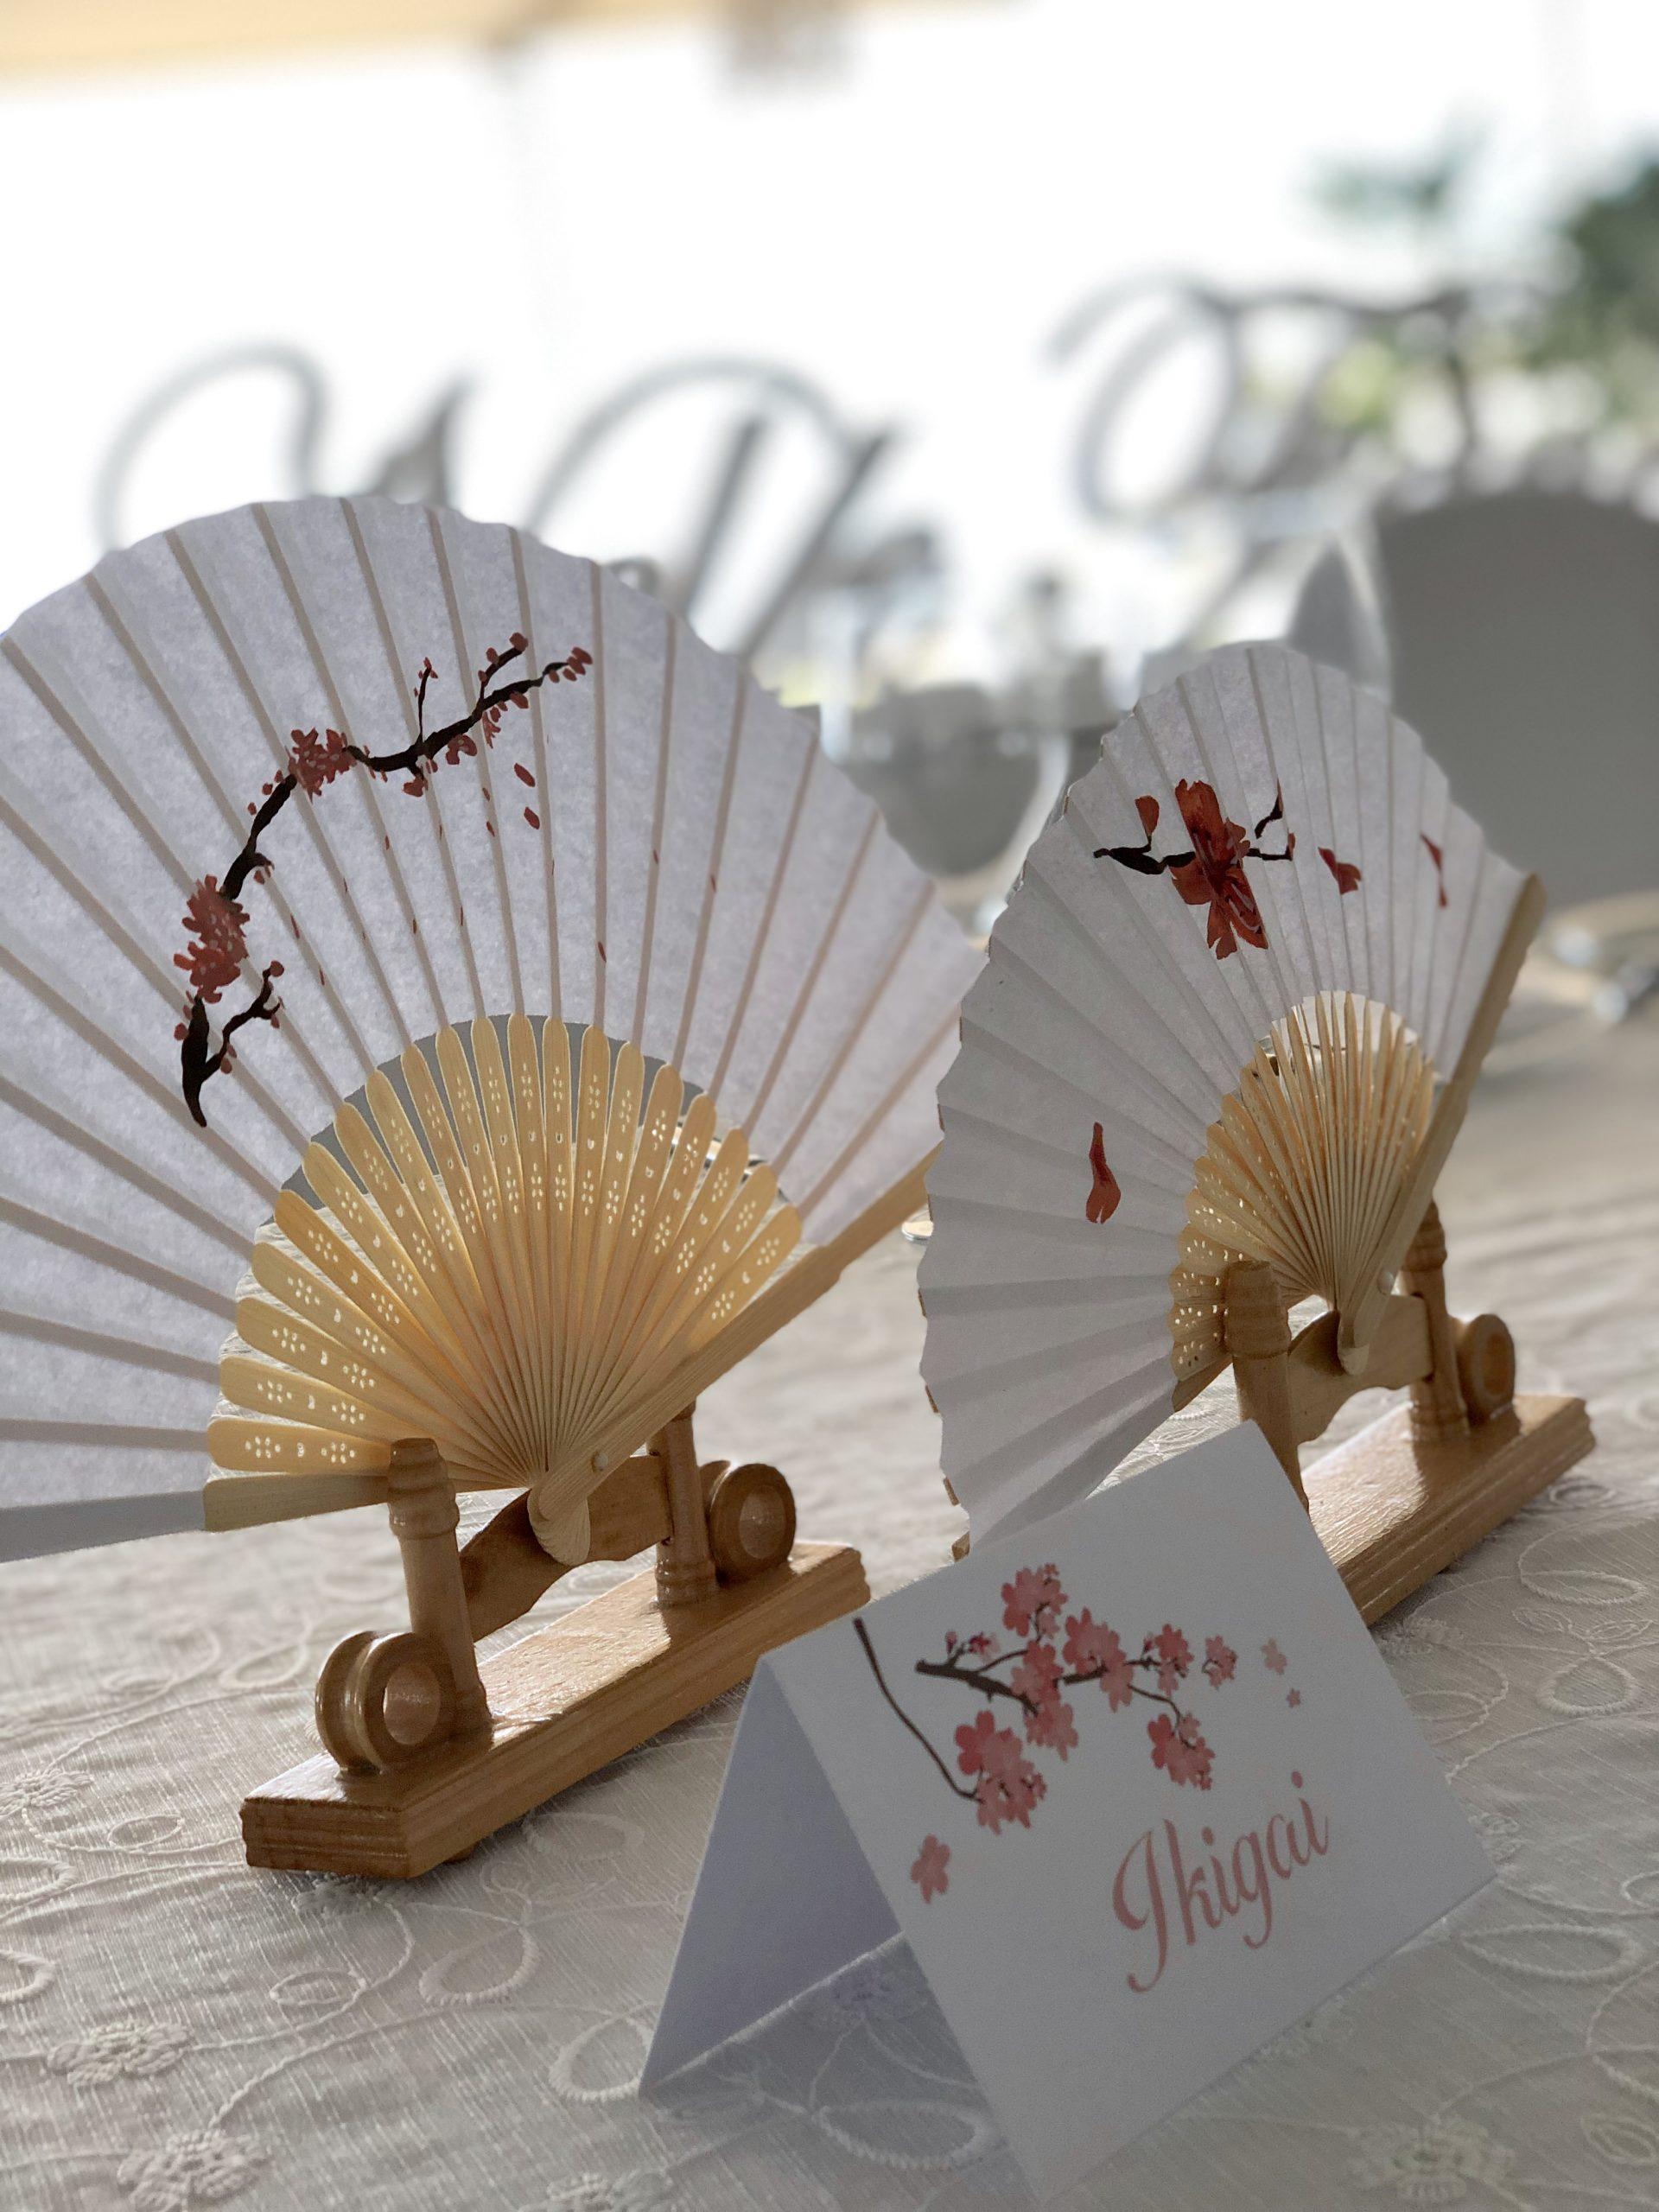 Allestimenti matrimonio Tema Giappone Garofalo Creazioni (1)